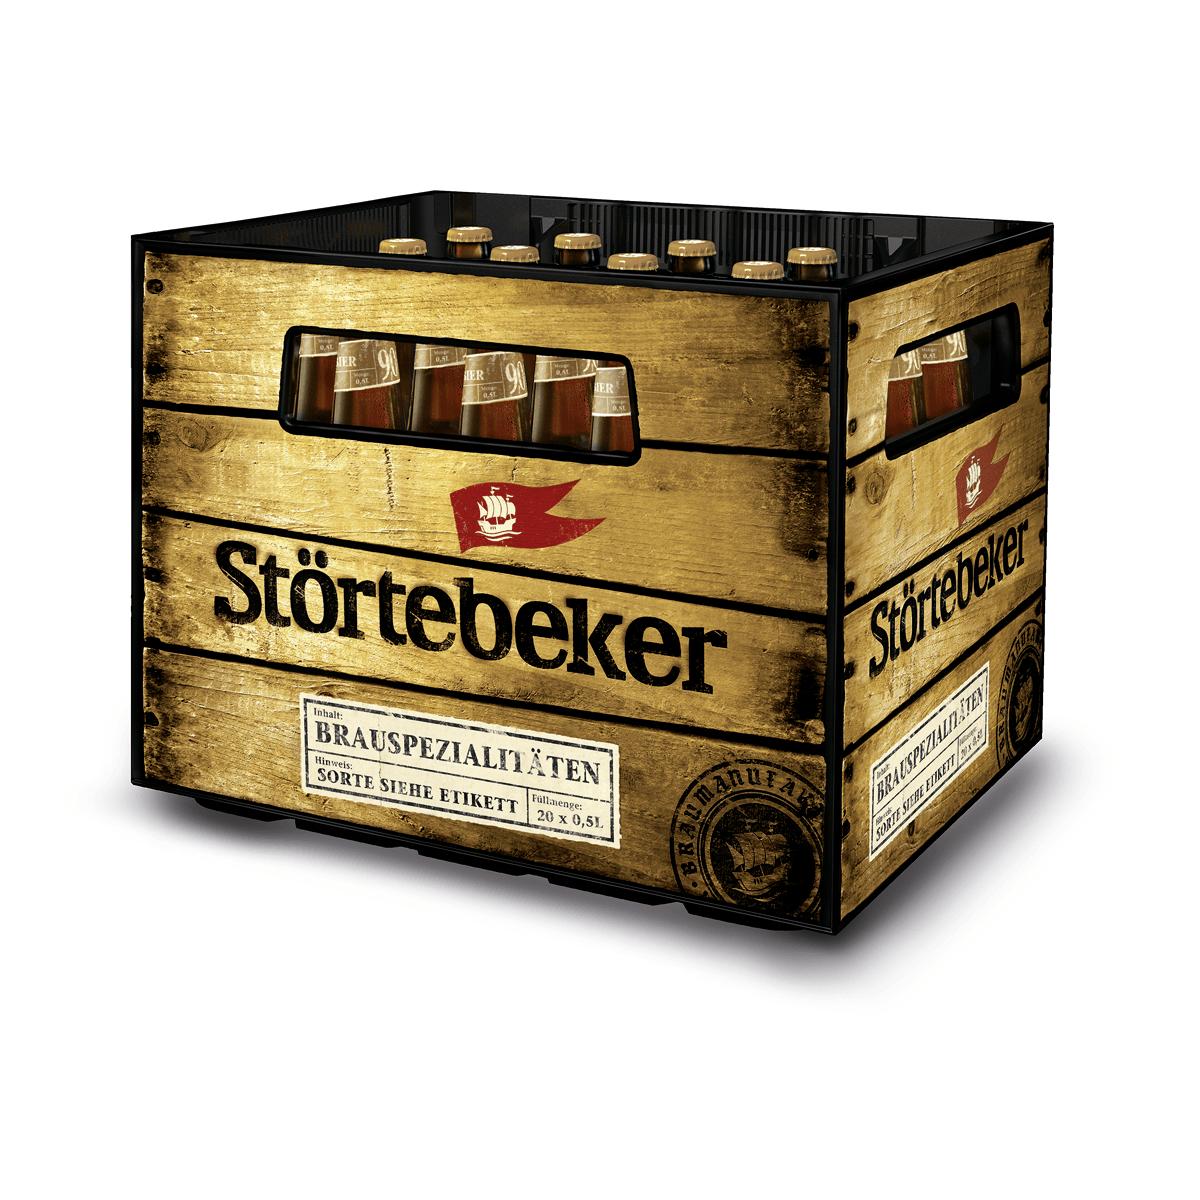 Störtebeker Scotch-Ale 20 x 0,5L   Spezialbier   Bier   Sortiment ...